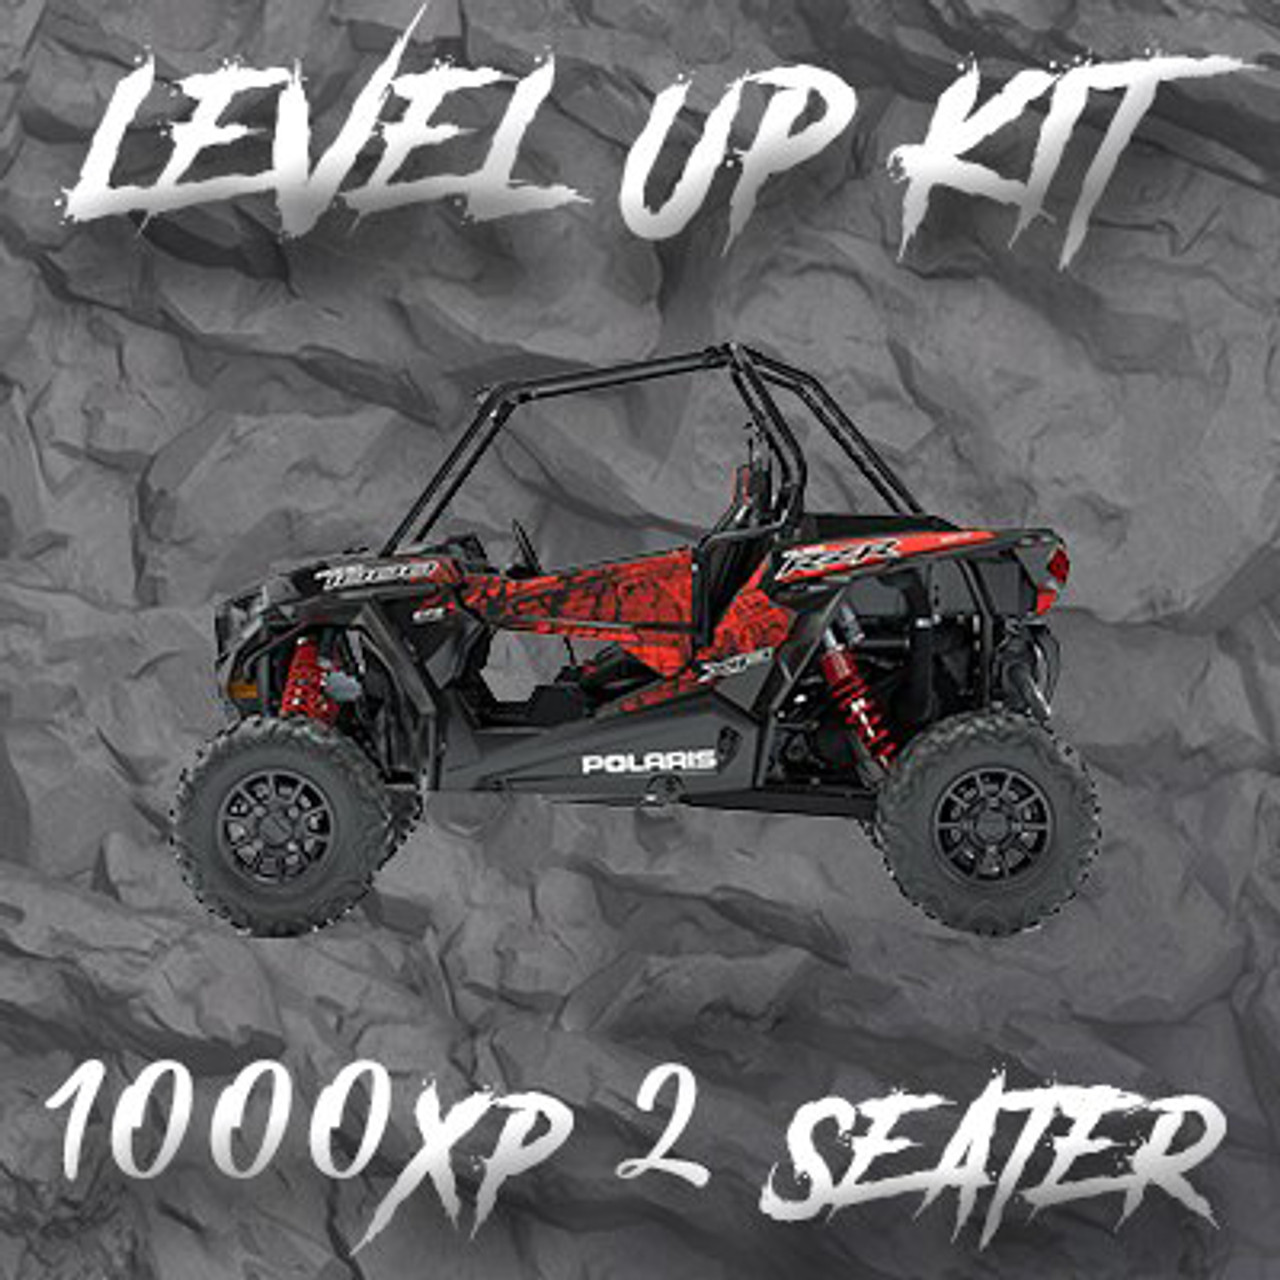 "Polaris RZR 2 Seat 1000XP ""Level Up"" Tender Swap Kit (2014-2021) Due to arrive 1/29/21"